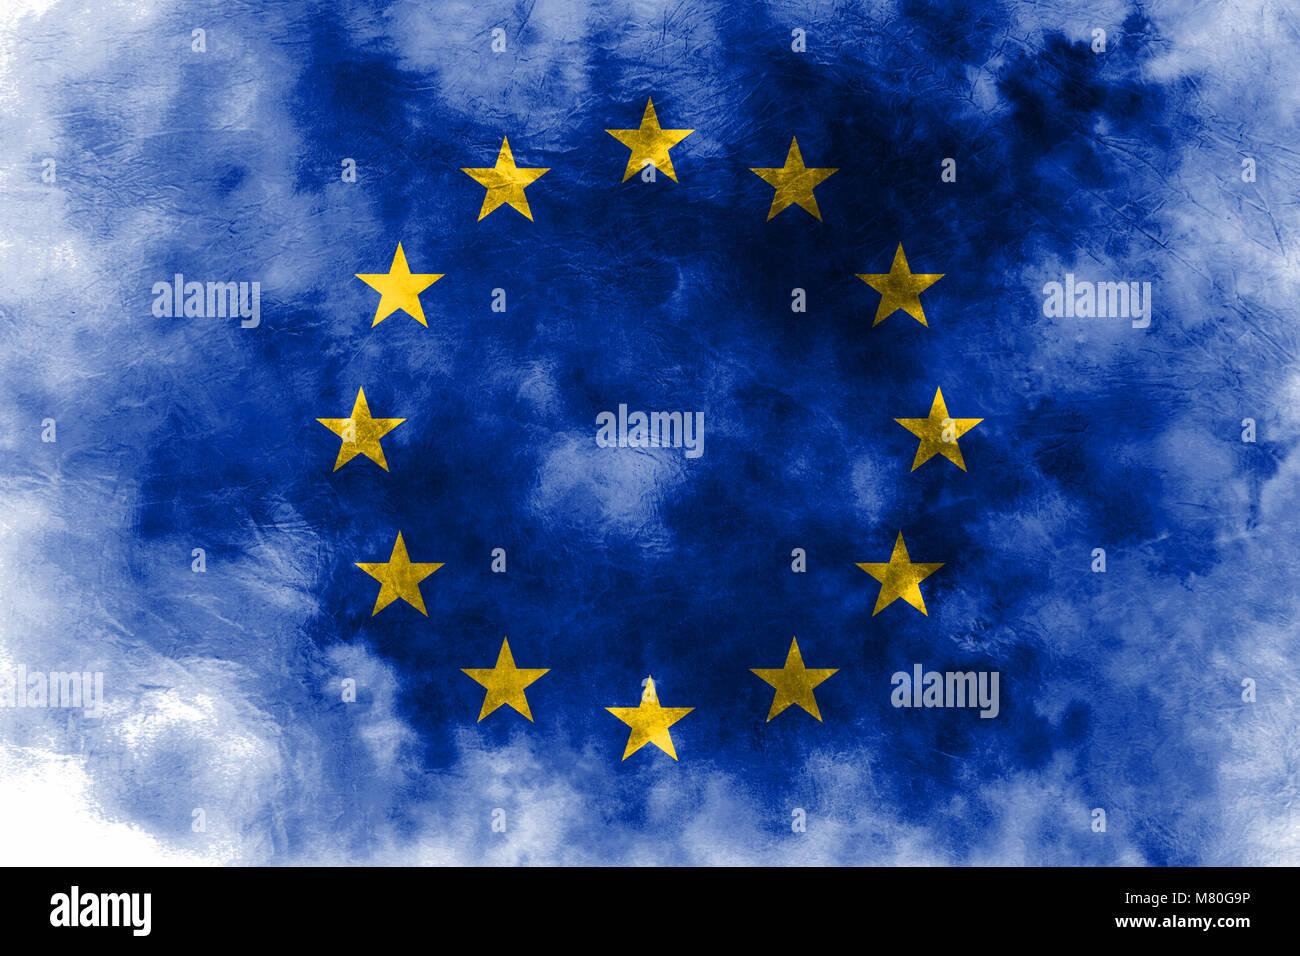 1b51b162896ee Damaged European Union Flag Stock Photos & Damaged European Union ...